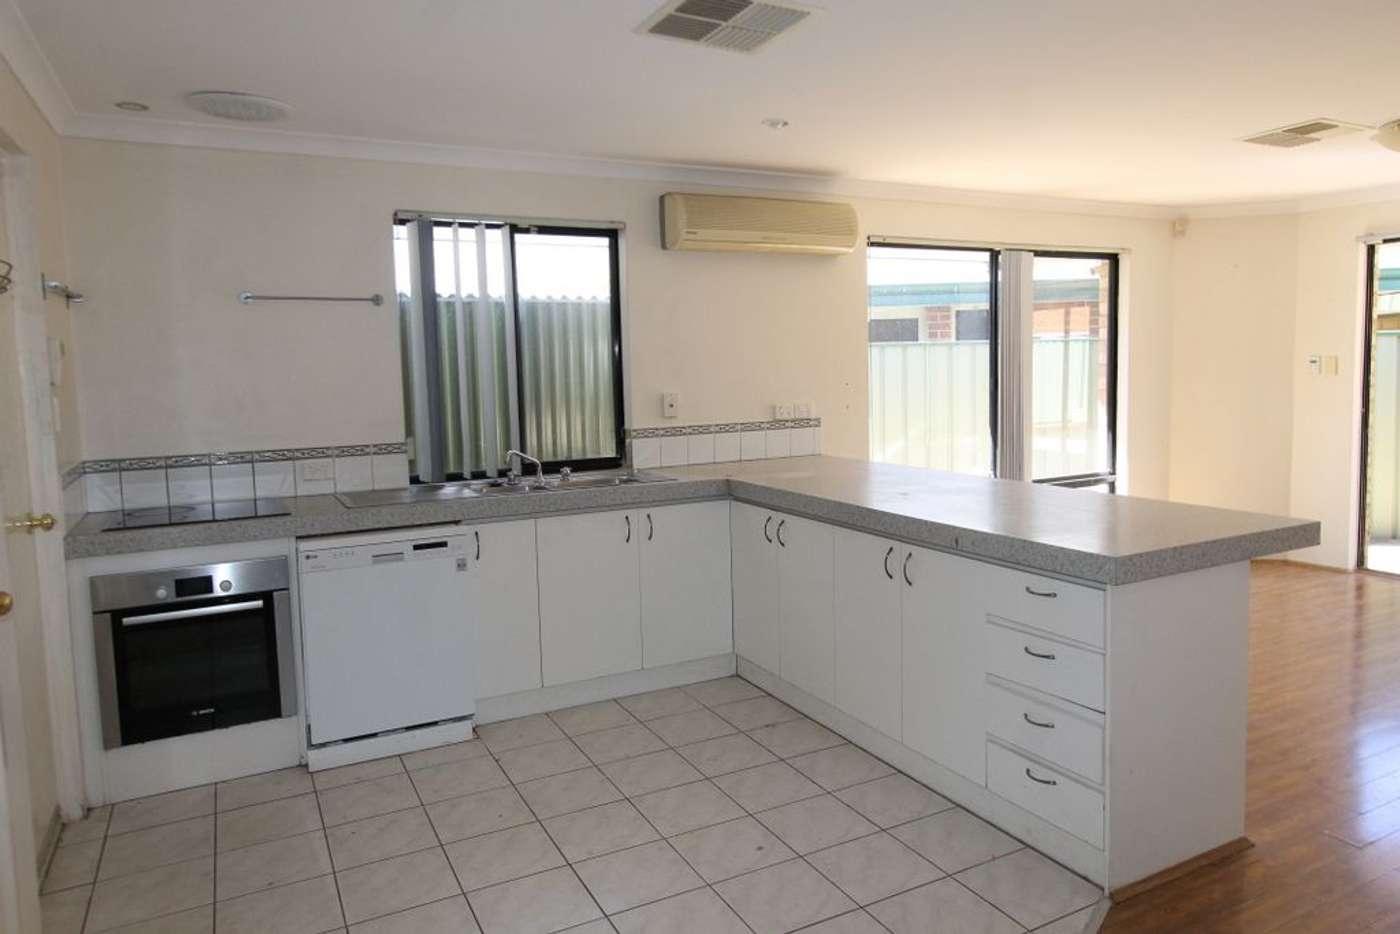 Seventh view of Homely house listing, 6 Tekapo Lane, Ballajura WA 6066